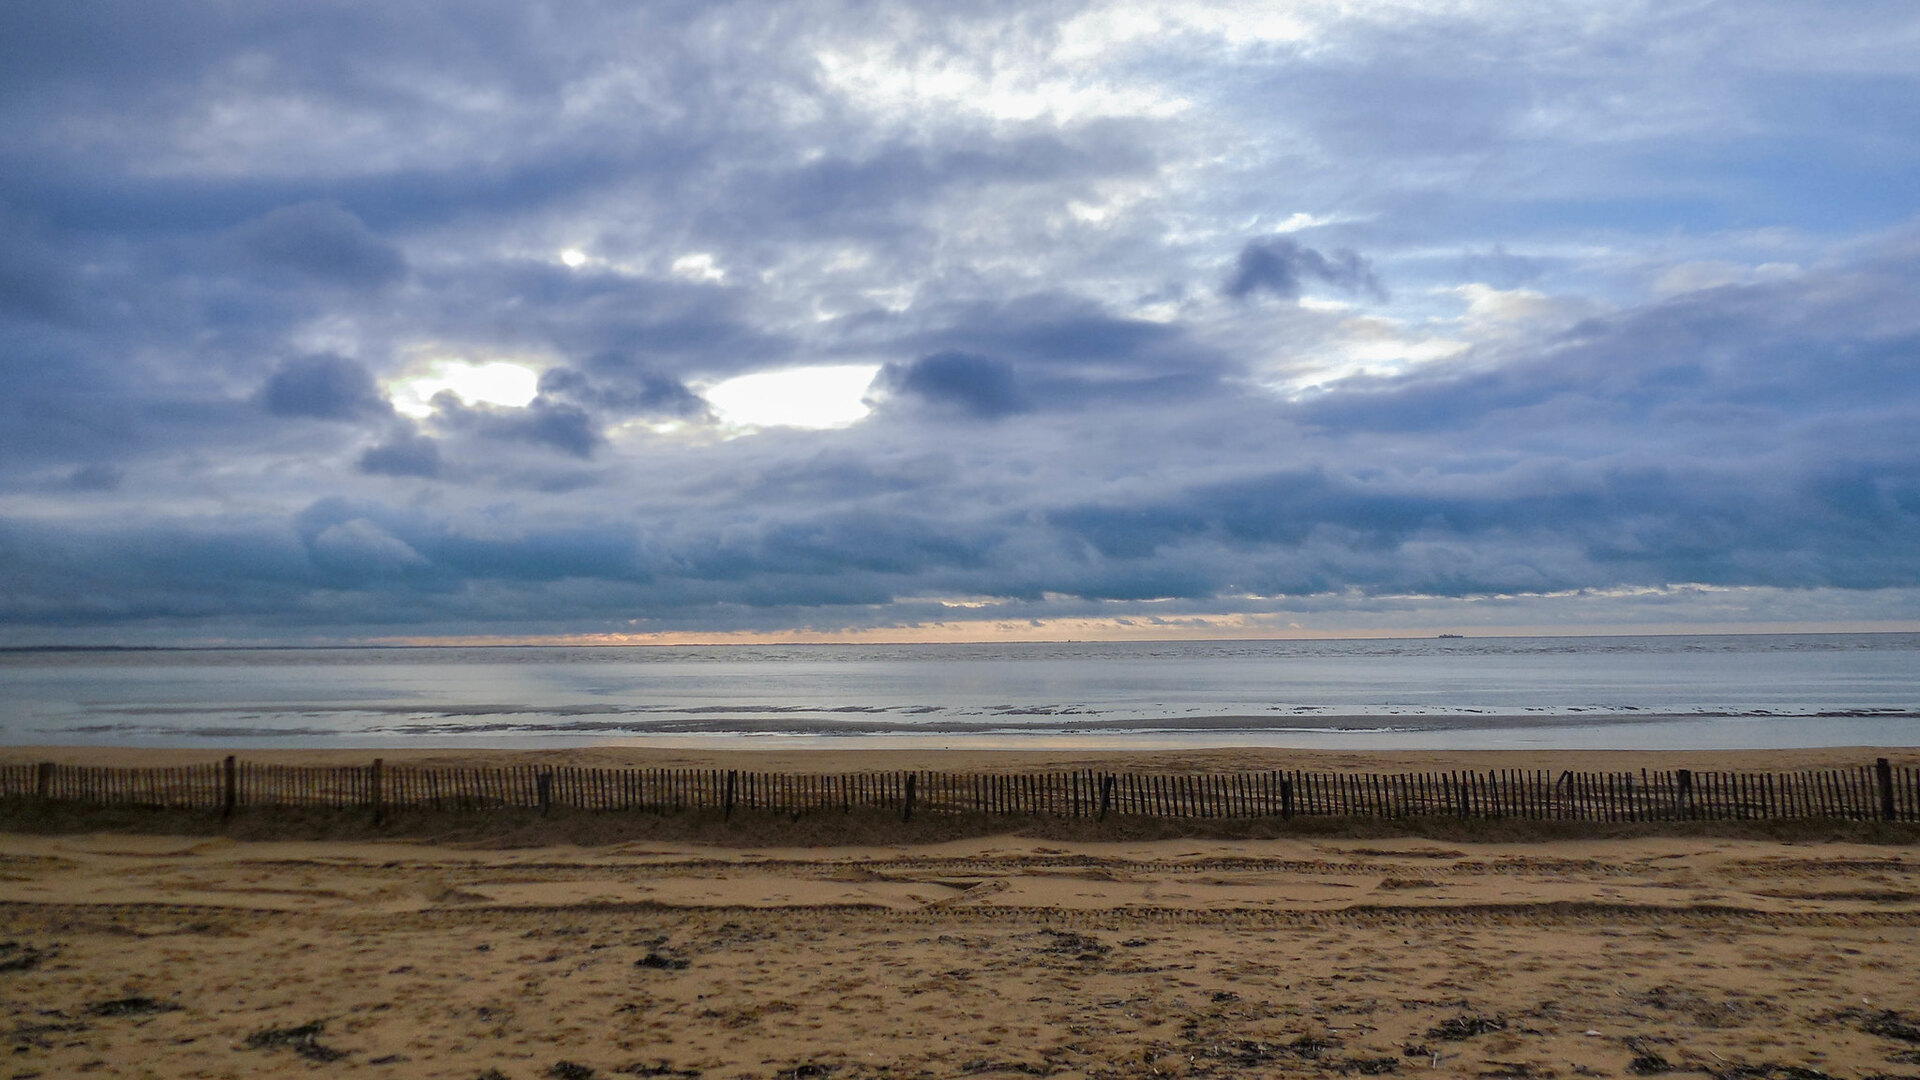 General 1920x1080 nature landscape sea sky clouds beach sand shore horizon